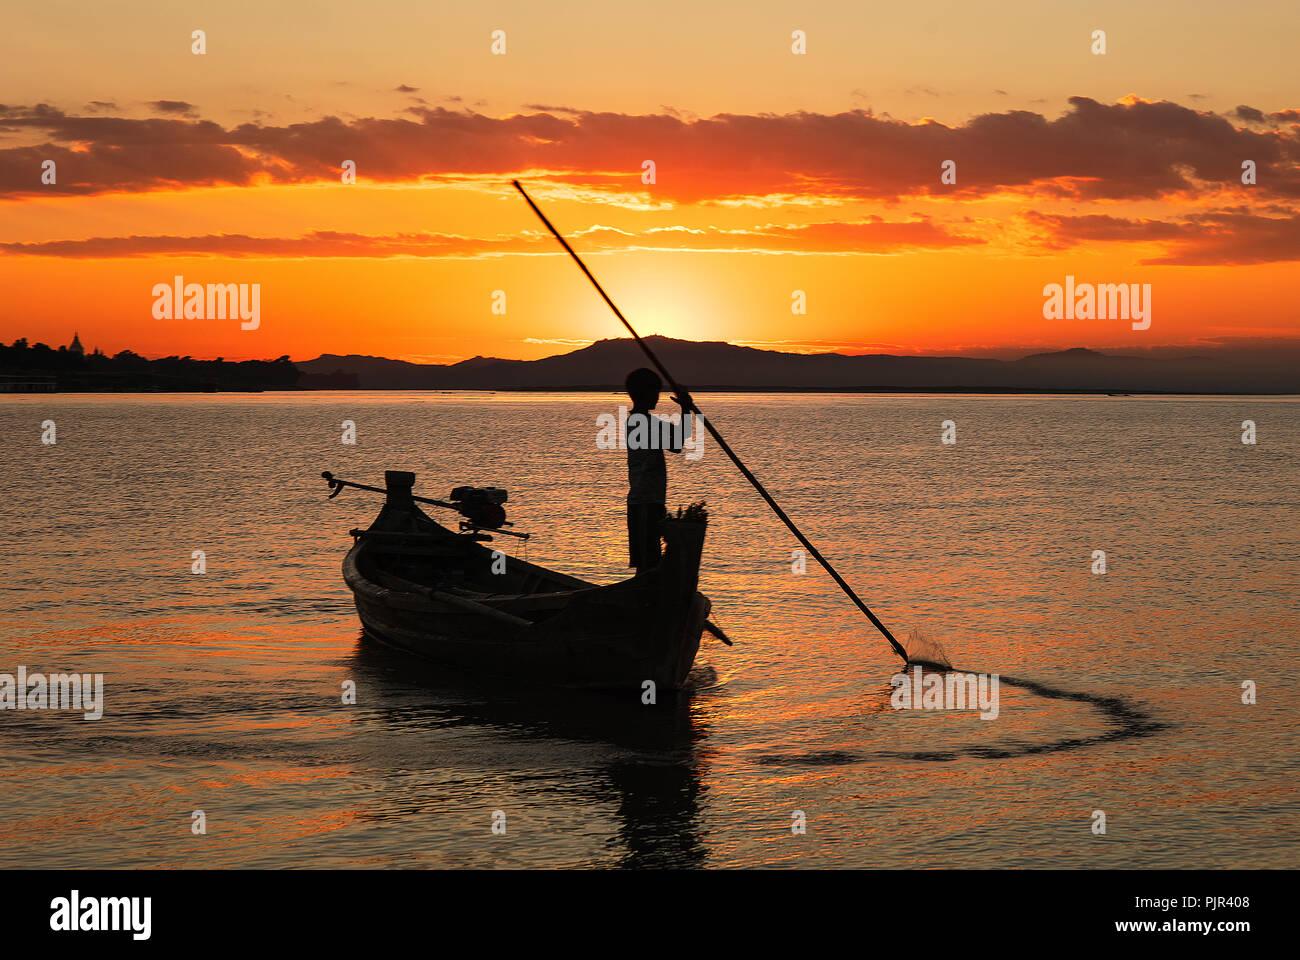 Silhouette of a youn fisherman on the Irrawaddy river at sunset, Nyaung U, Bagan, Myanmar (Burma). Stock Photo